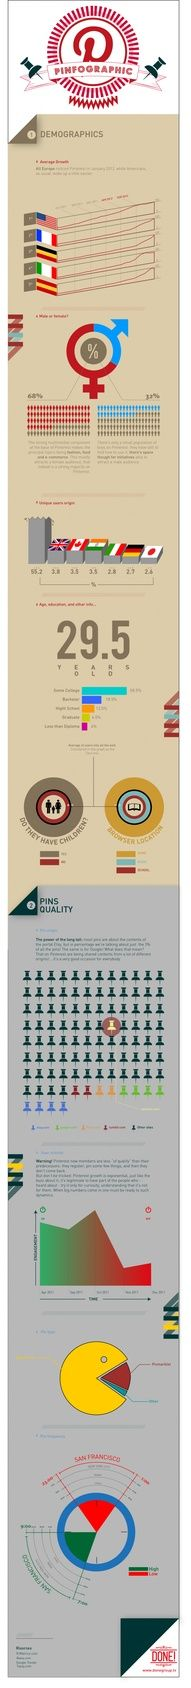 ¿Quién usa @Pinterest? #infografia #infographic